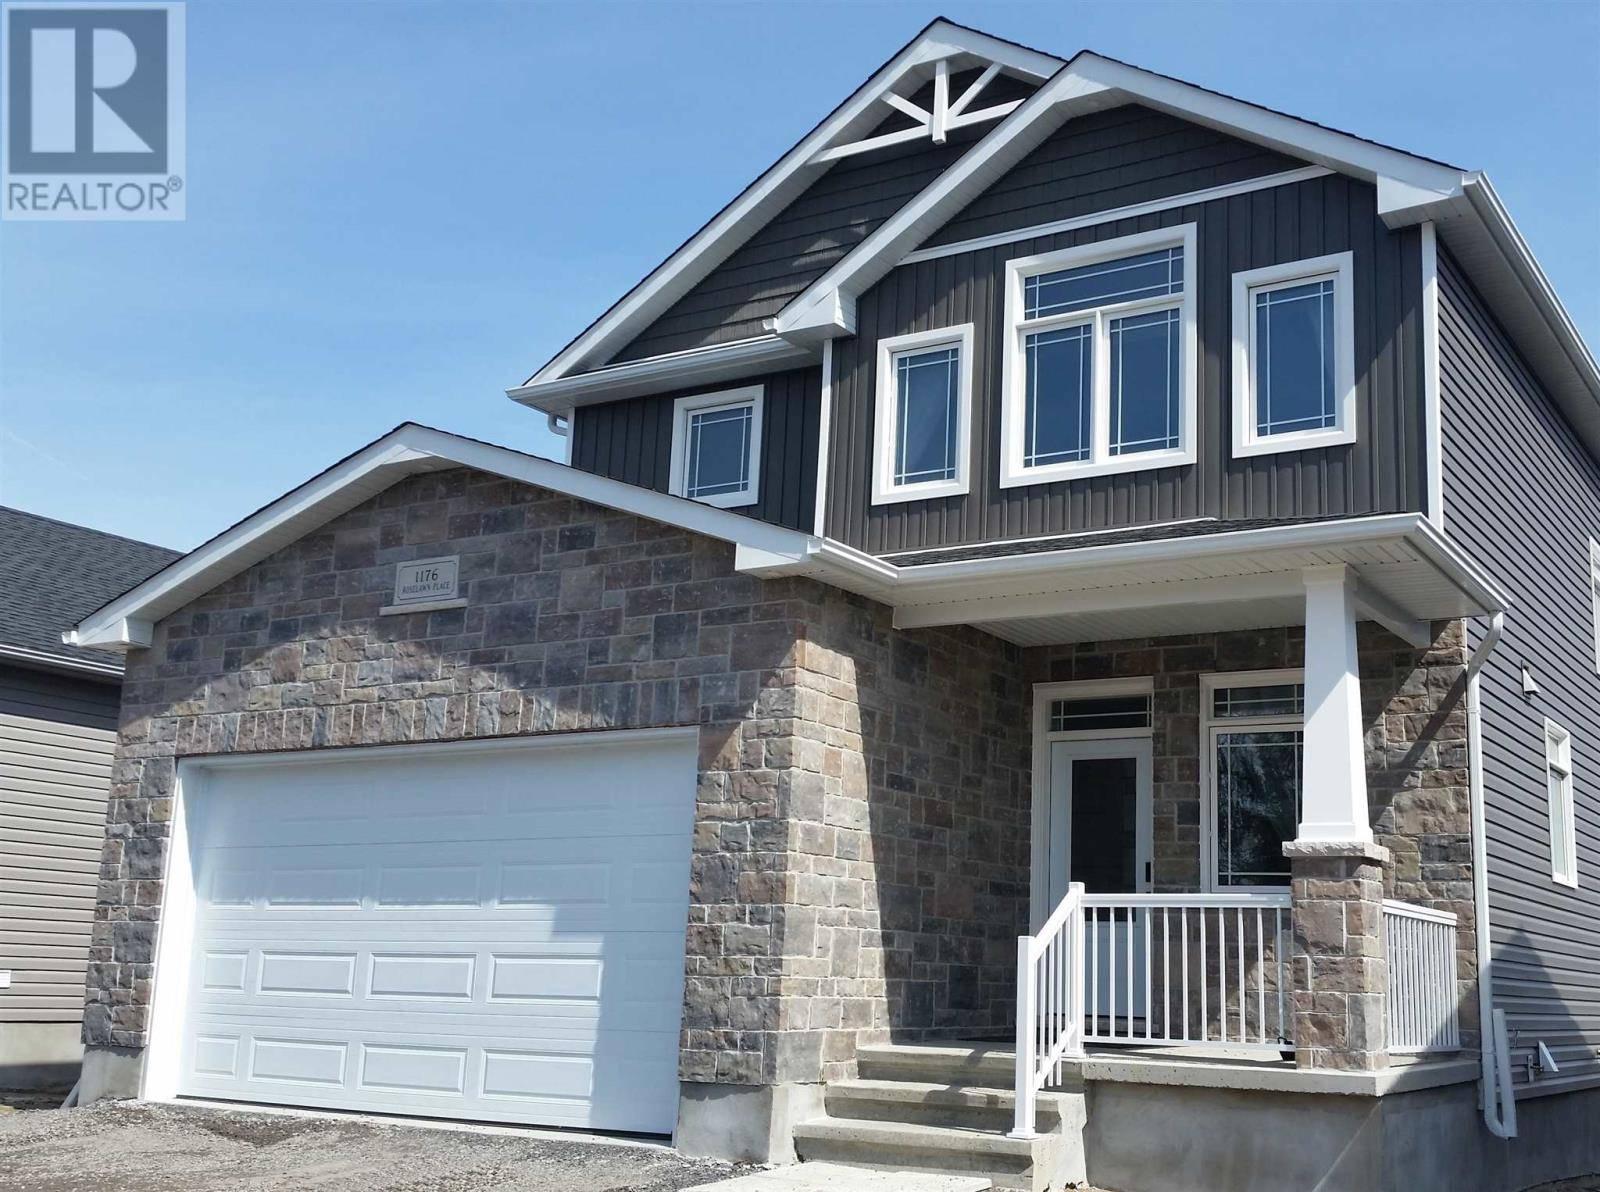 House for sale at 16 Remington (lot 16) Ave Unit 1418 Kingston Ontario - MLS: K20001411